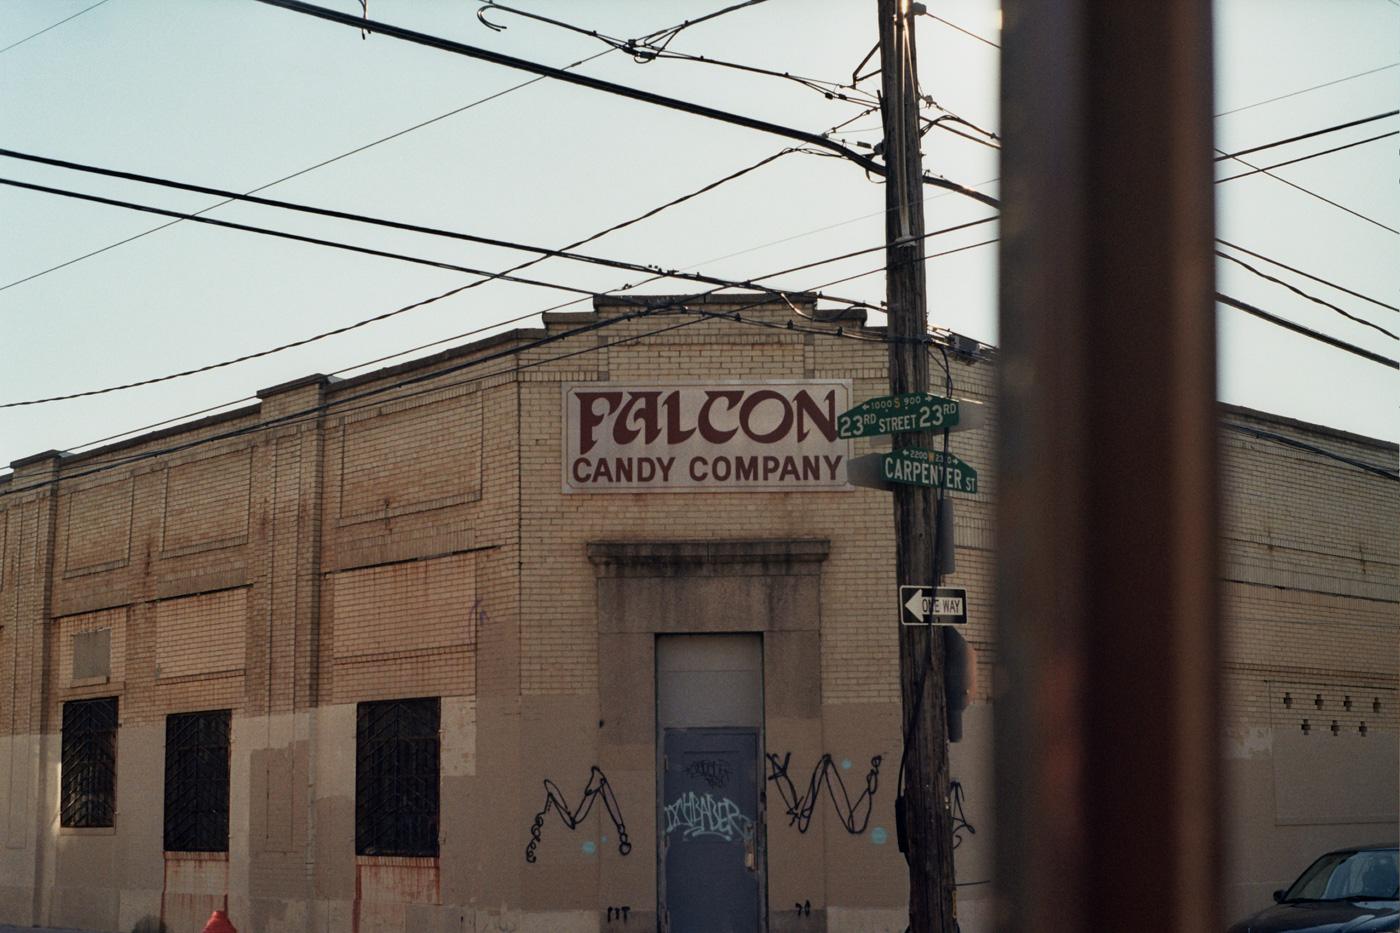 Falcon Candy Company